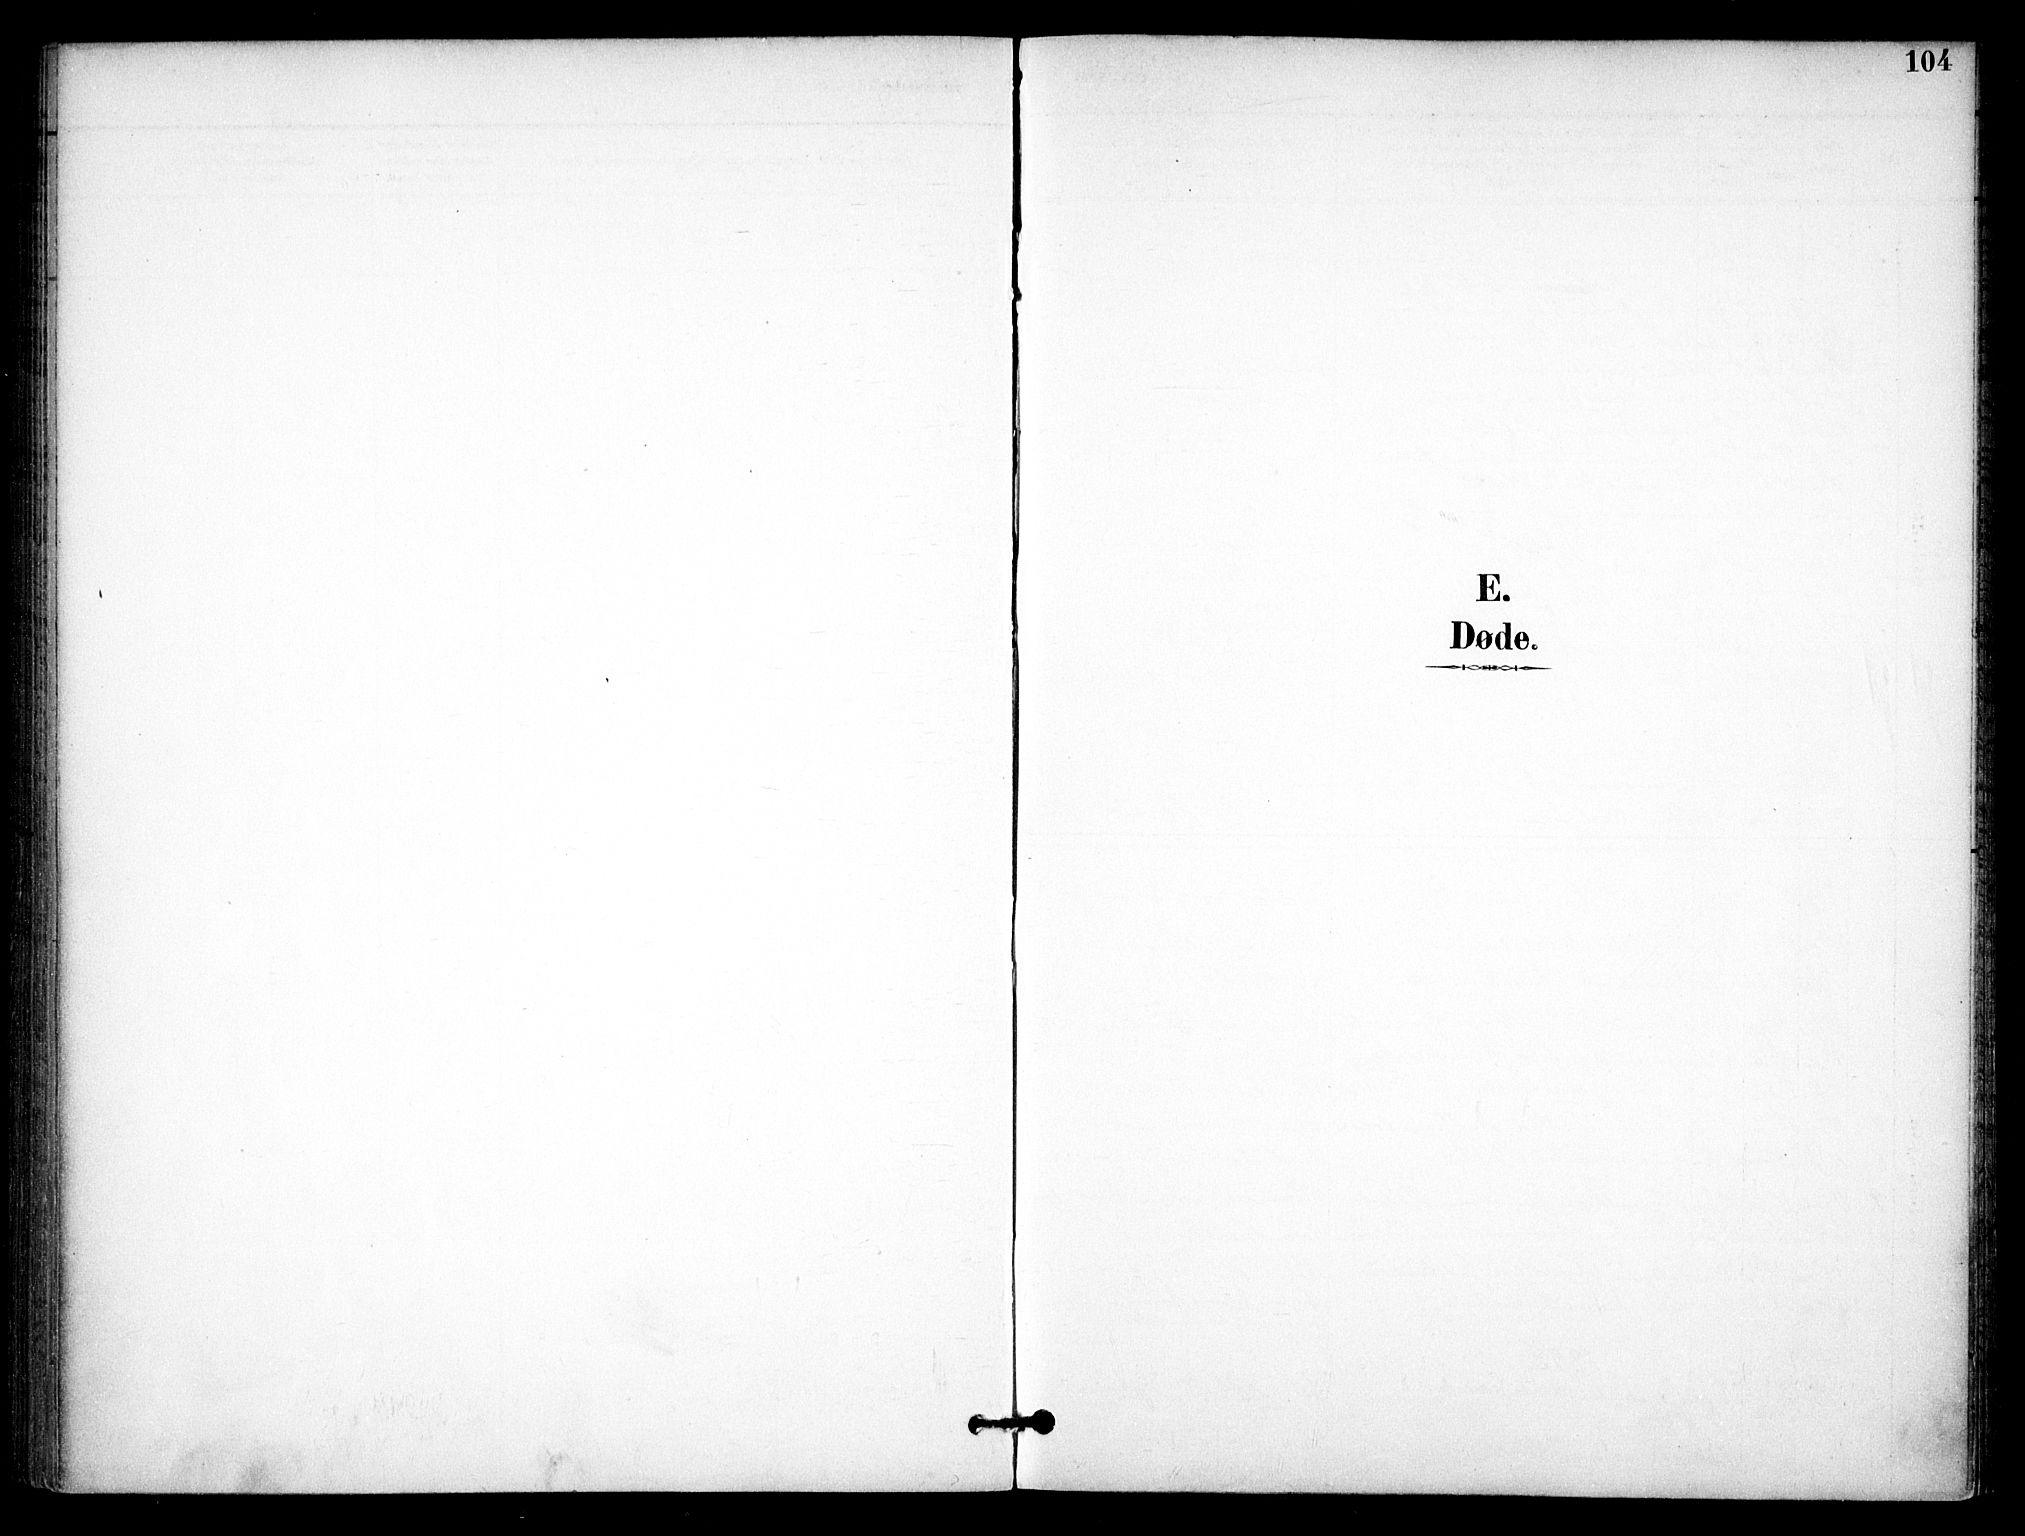 SAO, Nannestad prestekontor Kirkebøker, F/Fb/L0002: Ministerialbok nr. II 2, 1891-1909, s. 104